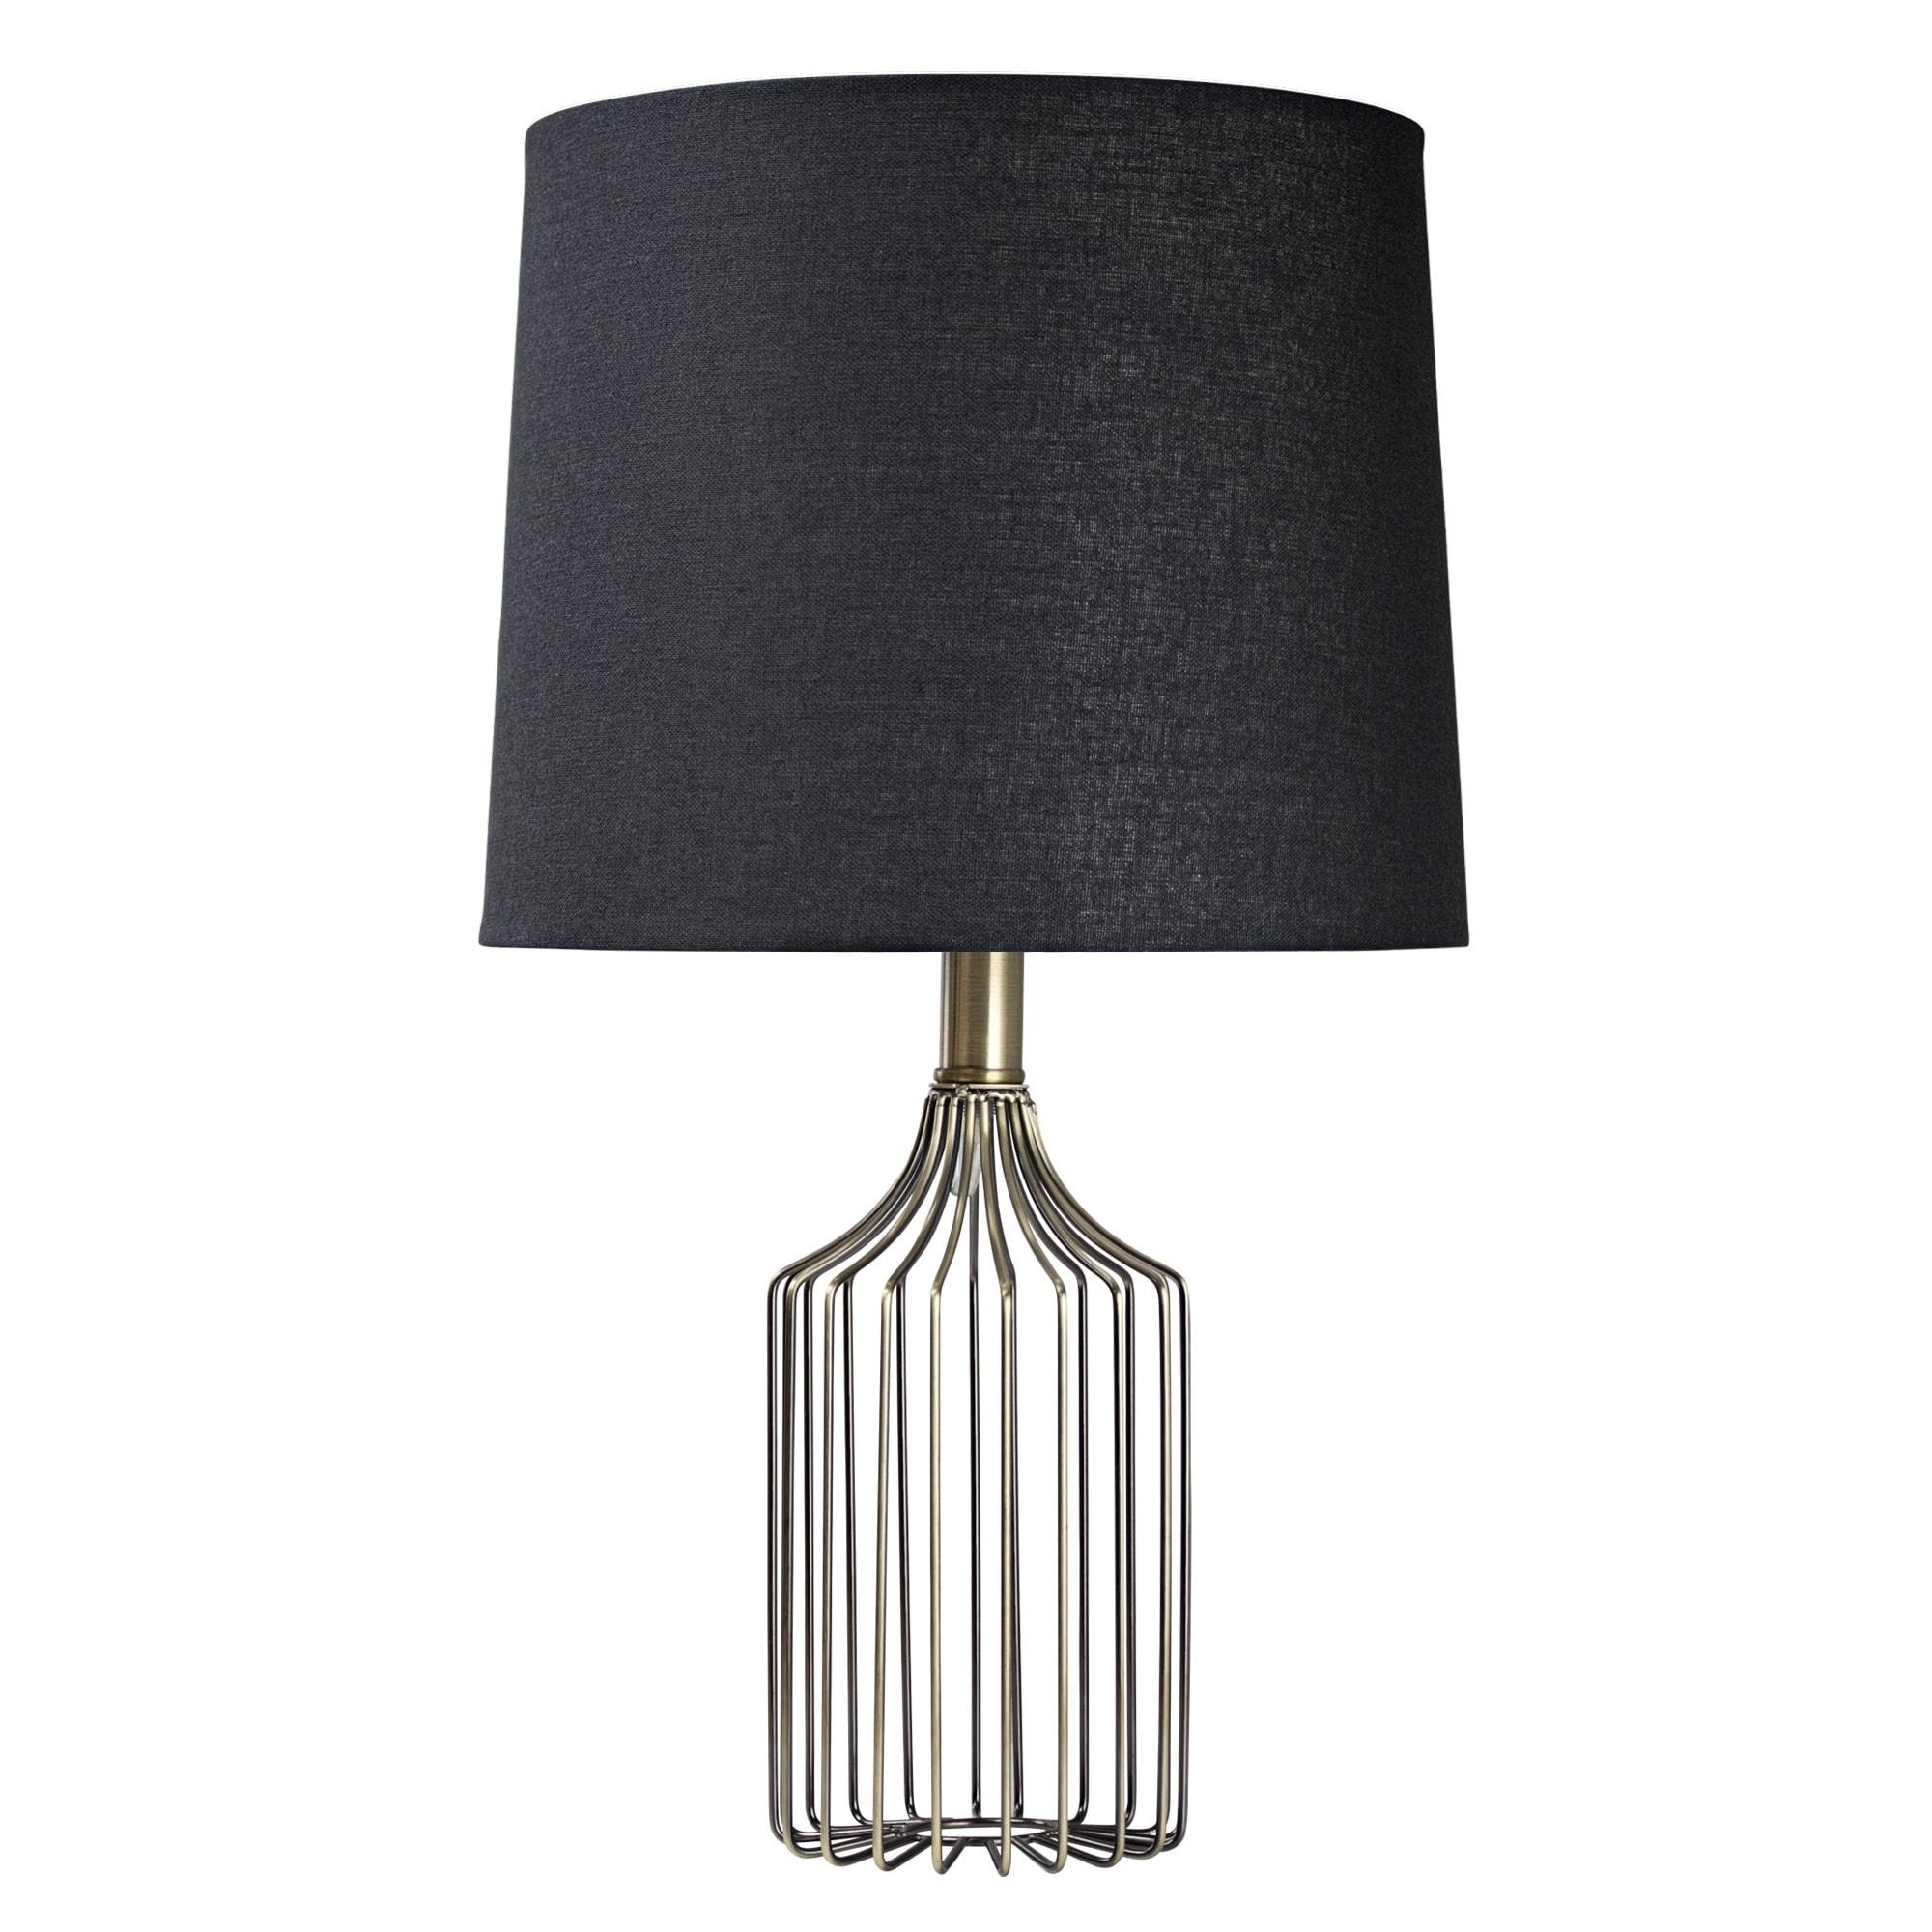 American Art Decor Wireframe Metal Table Lamp (20